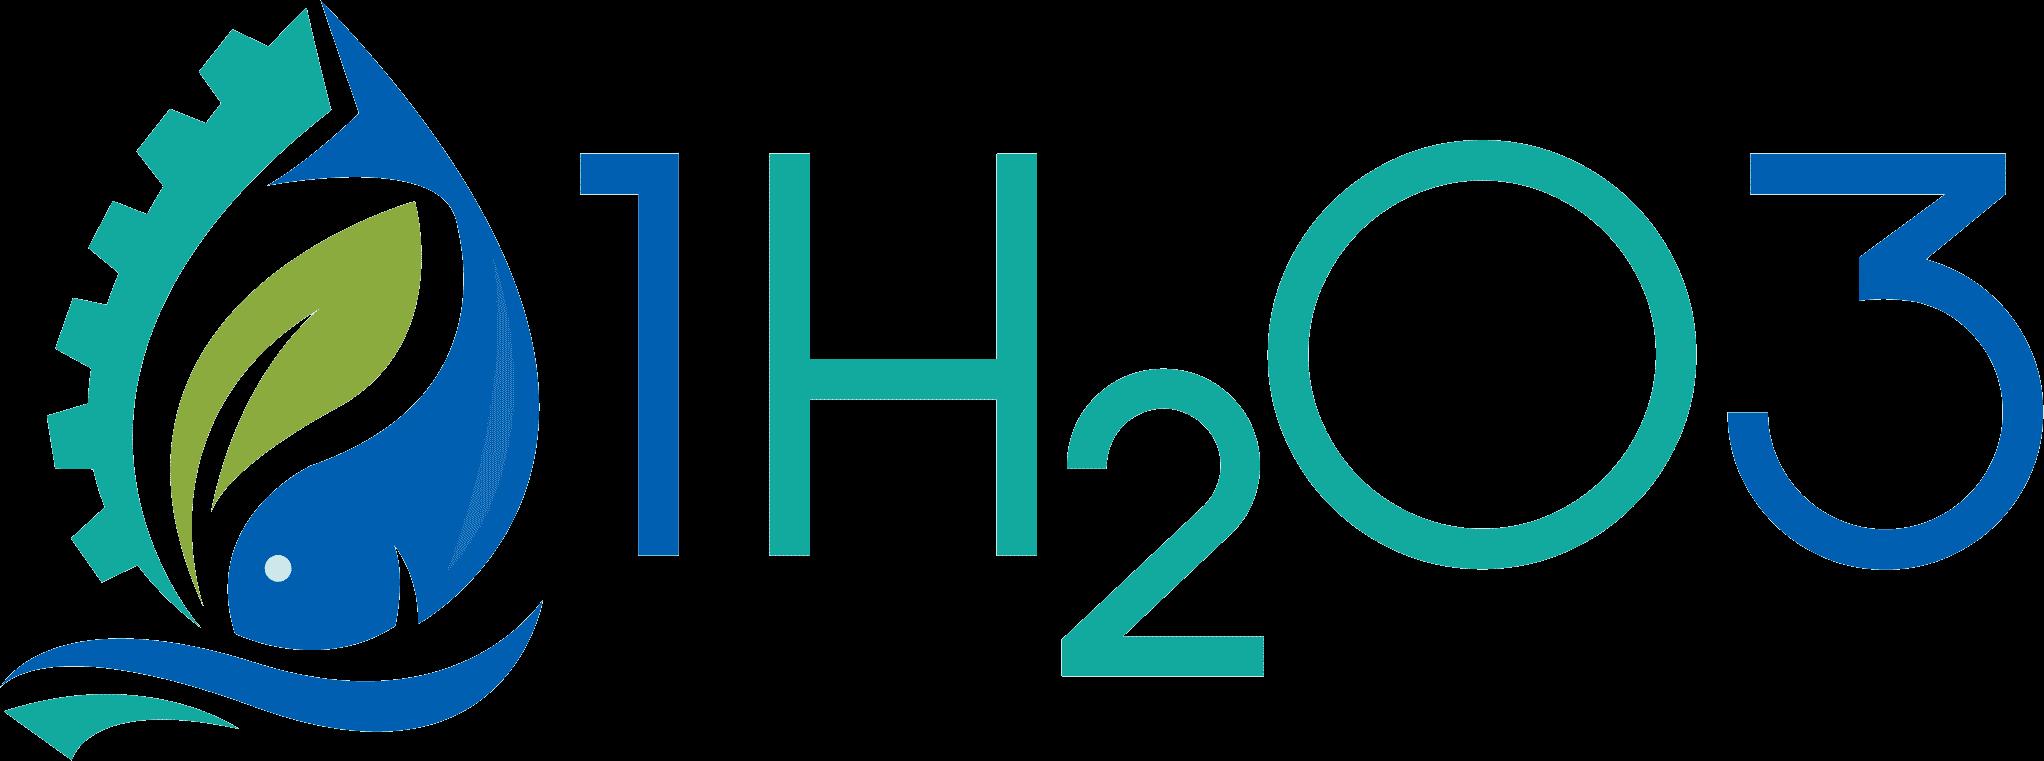 1H2O3